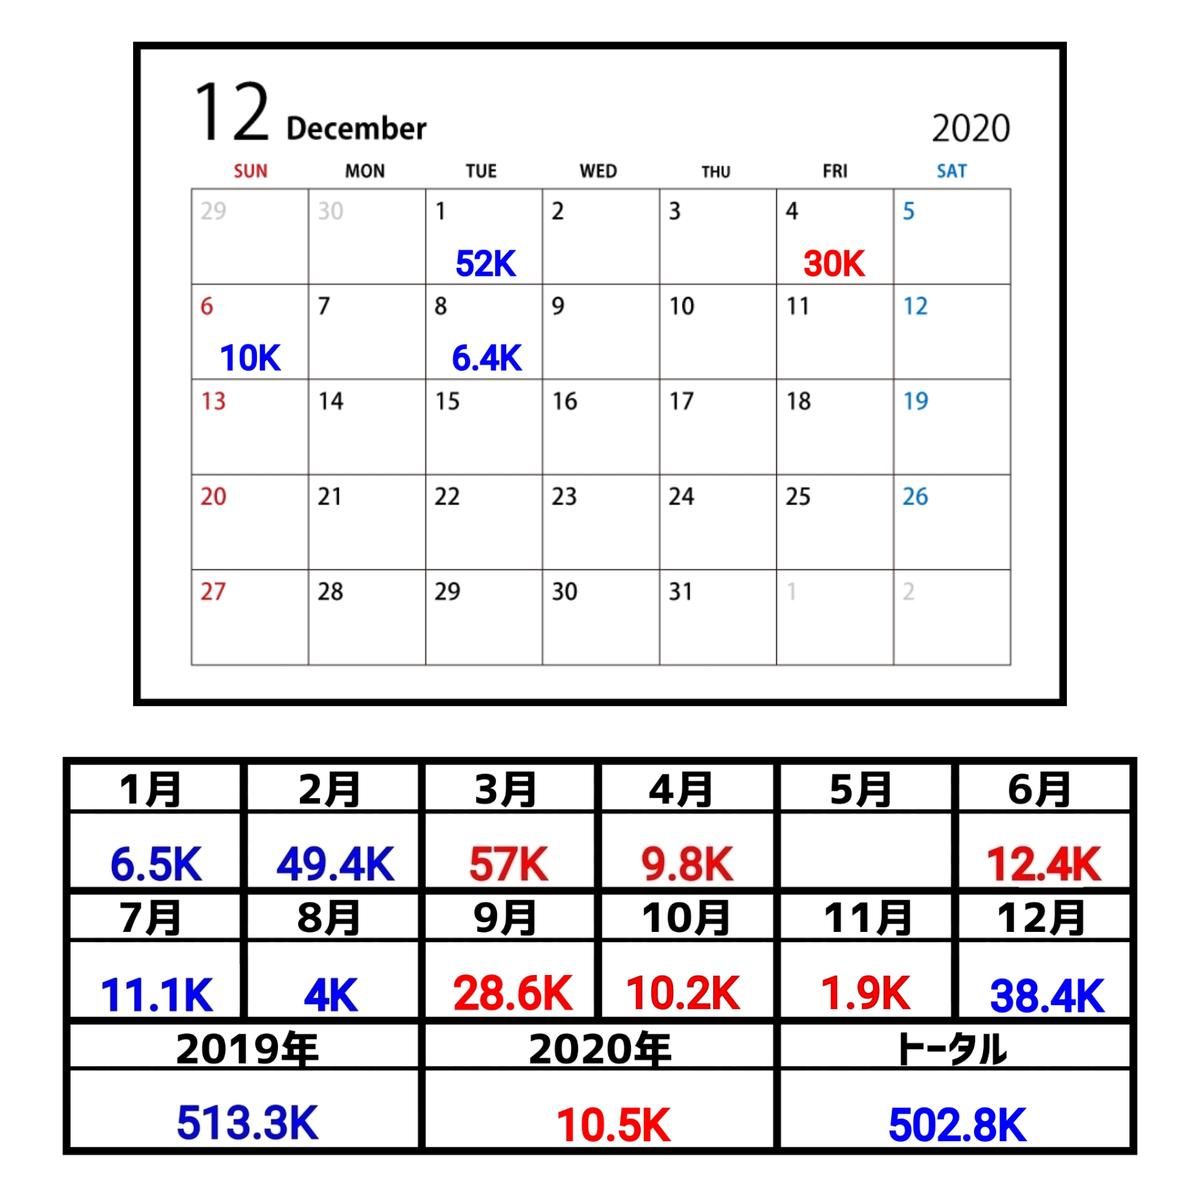 f:id:kohdyun:20201212130744j:plain